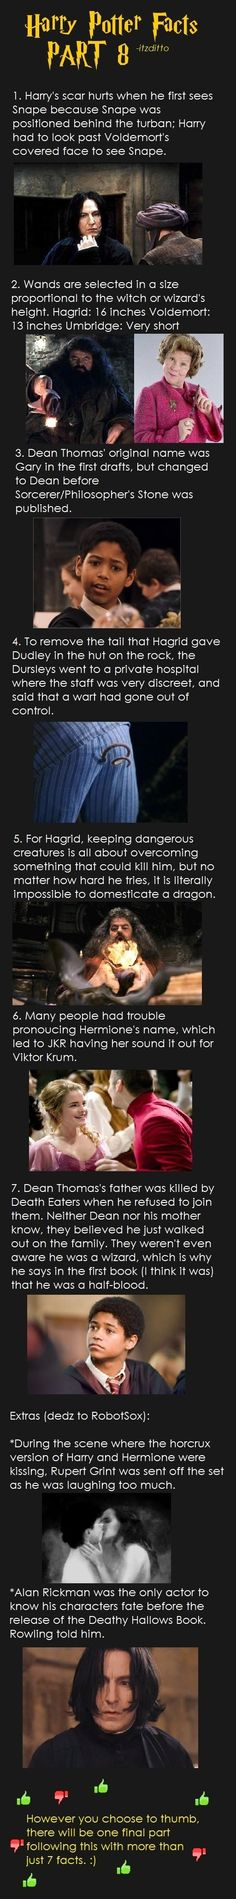 Harry Potter - Fact 8: